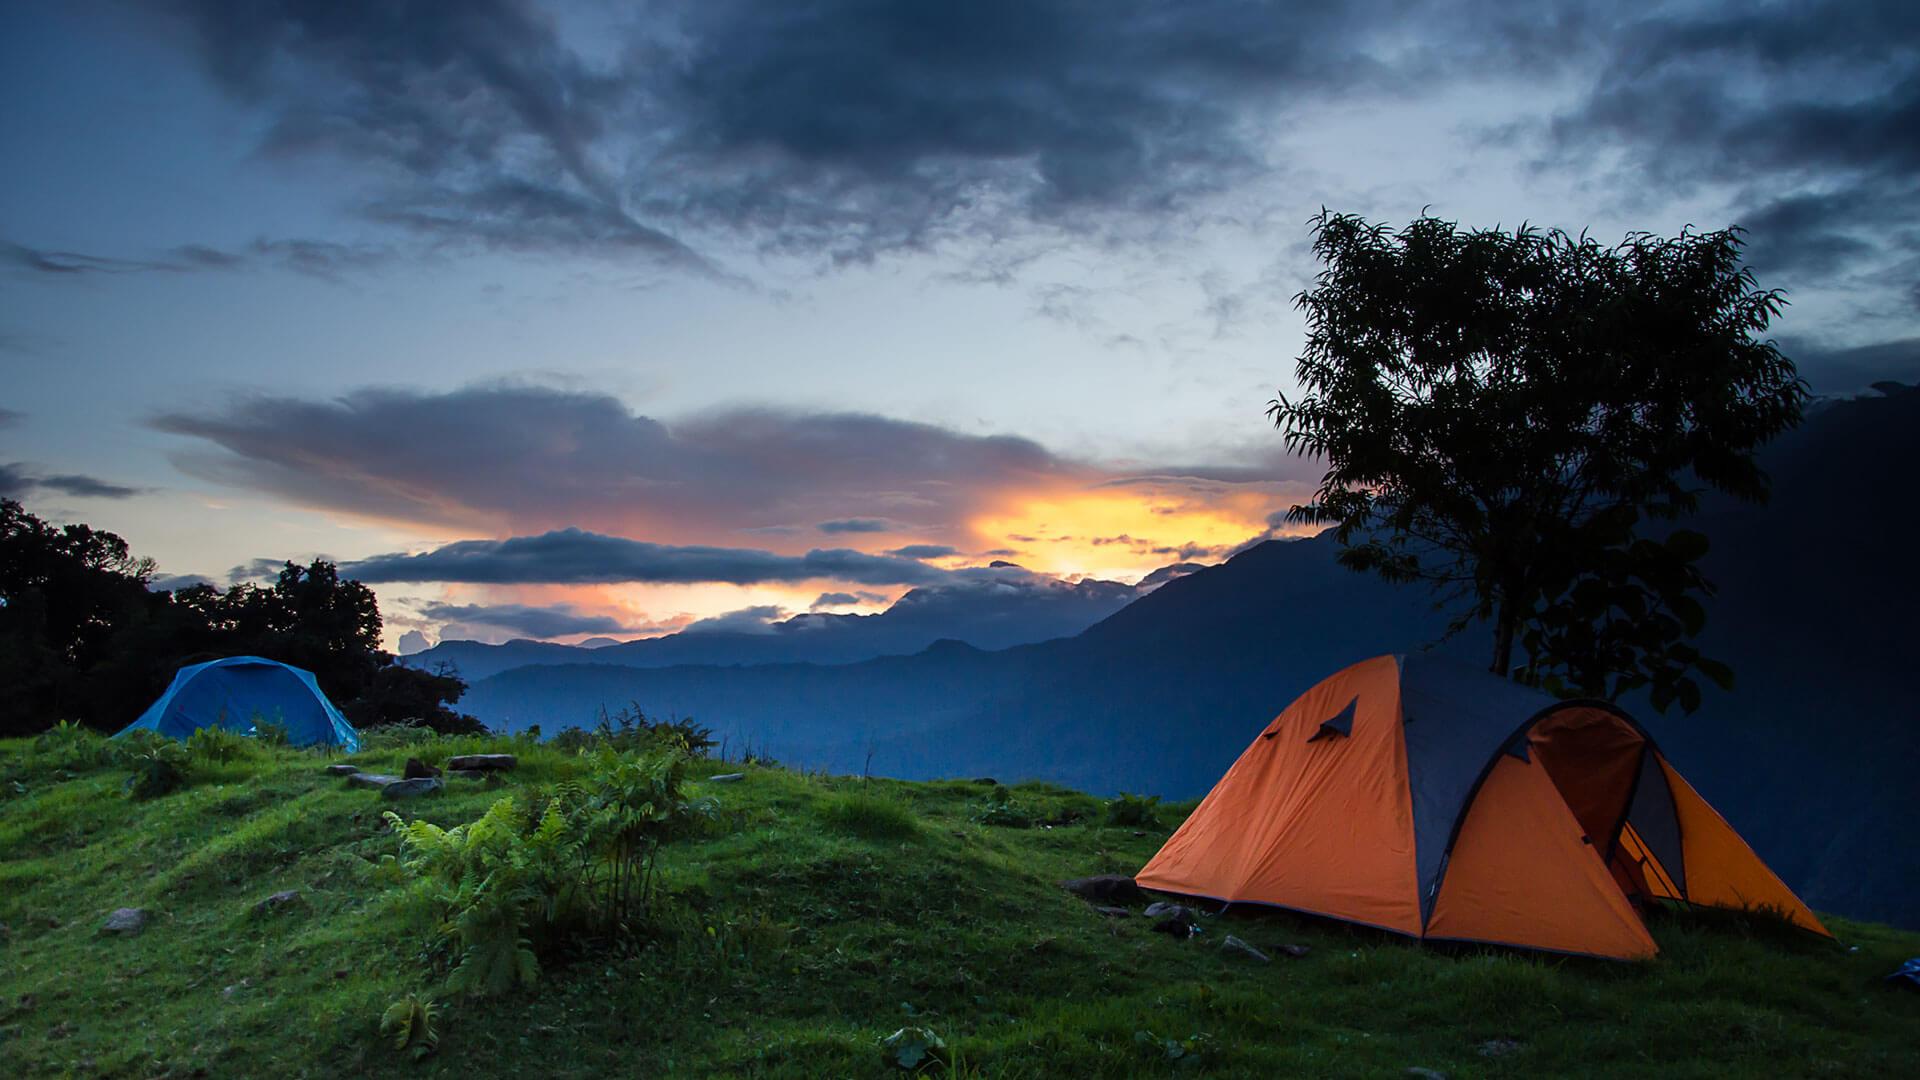 Yuksom Sikkim | Things to do in Yuksom | Top Places to Visit in Yuksom |  Adotrip